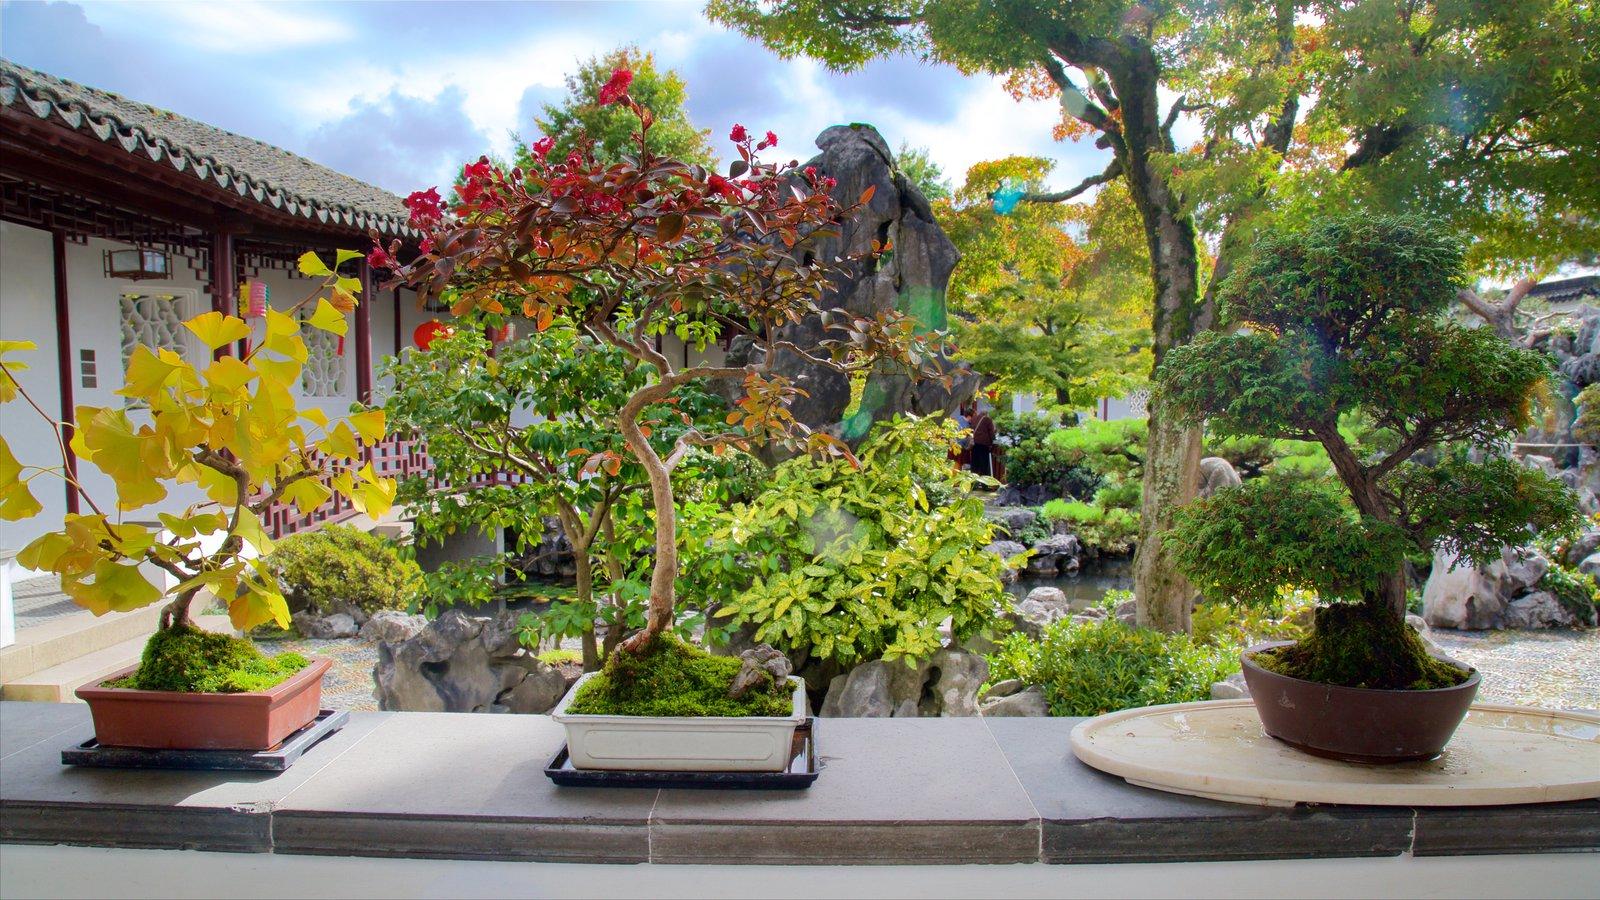 Dr Sun Yat Sen Classical Chinese Garden Pictures View Photos Amp Images Of Dr Sun Yat Sen